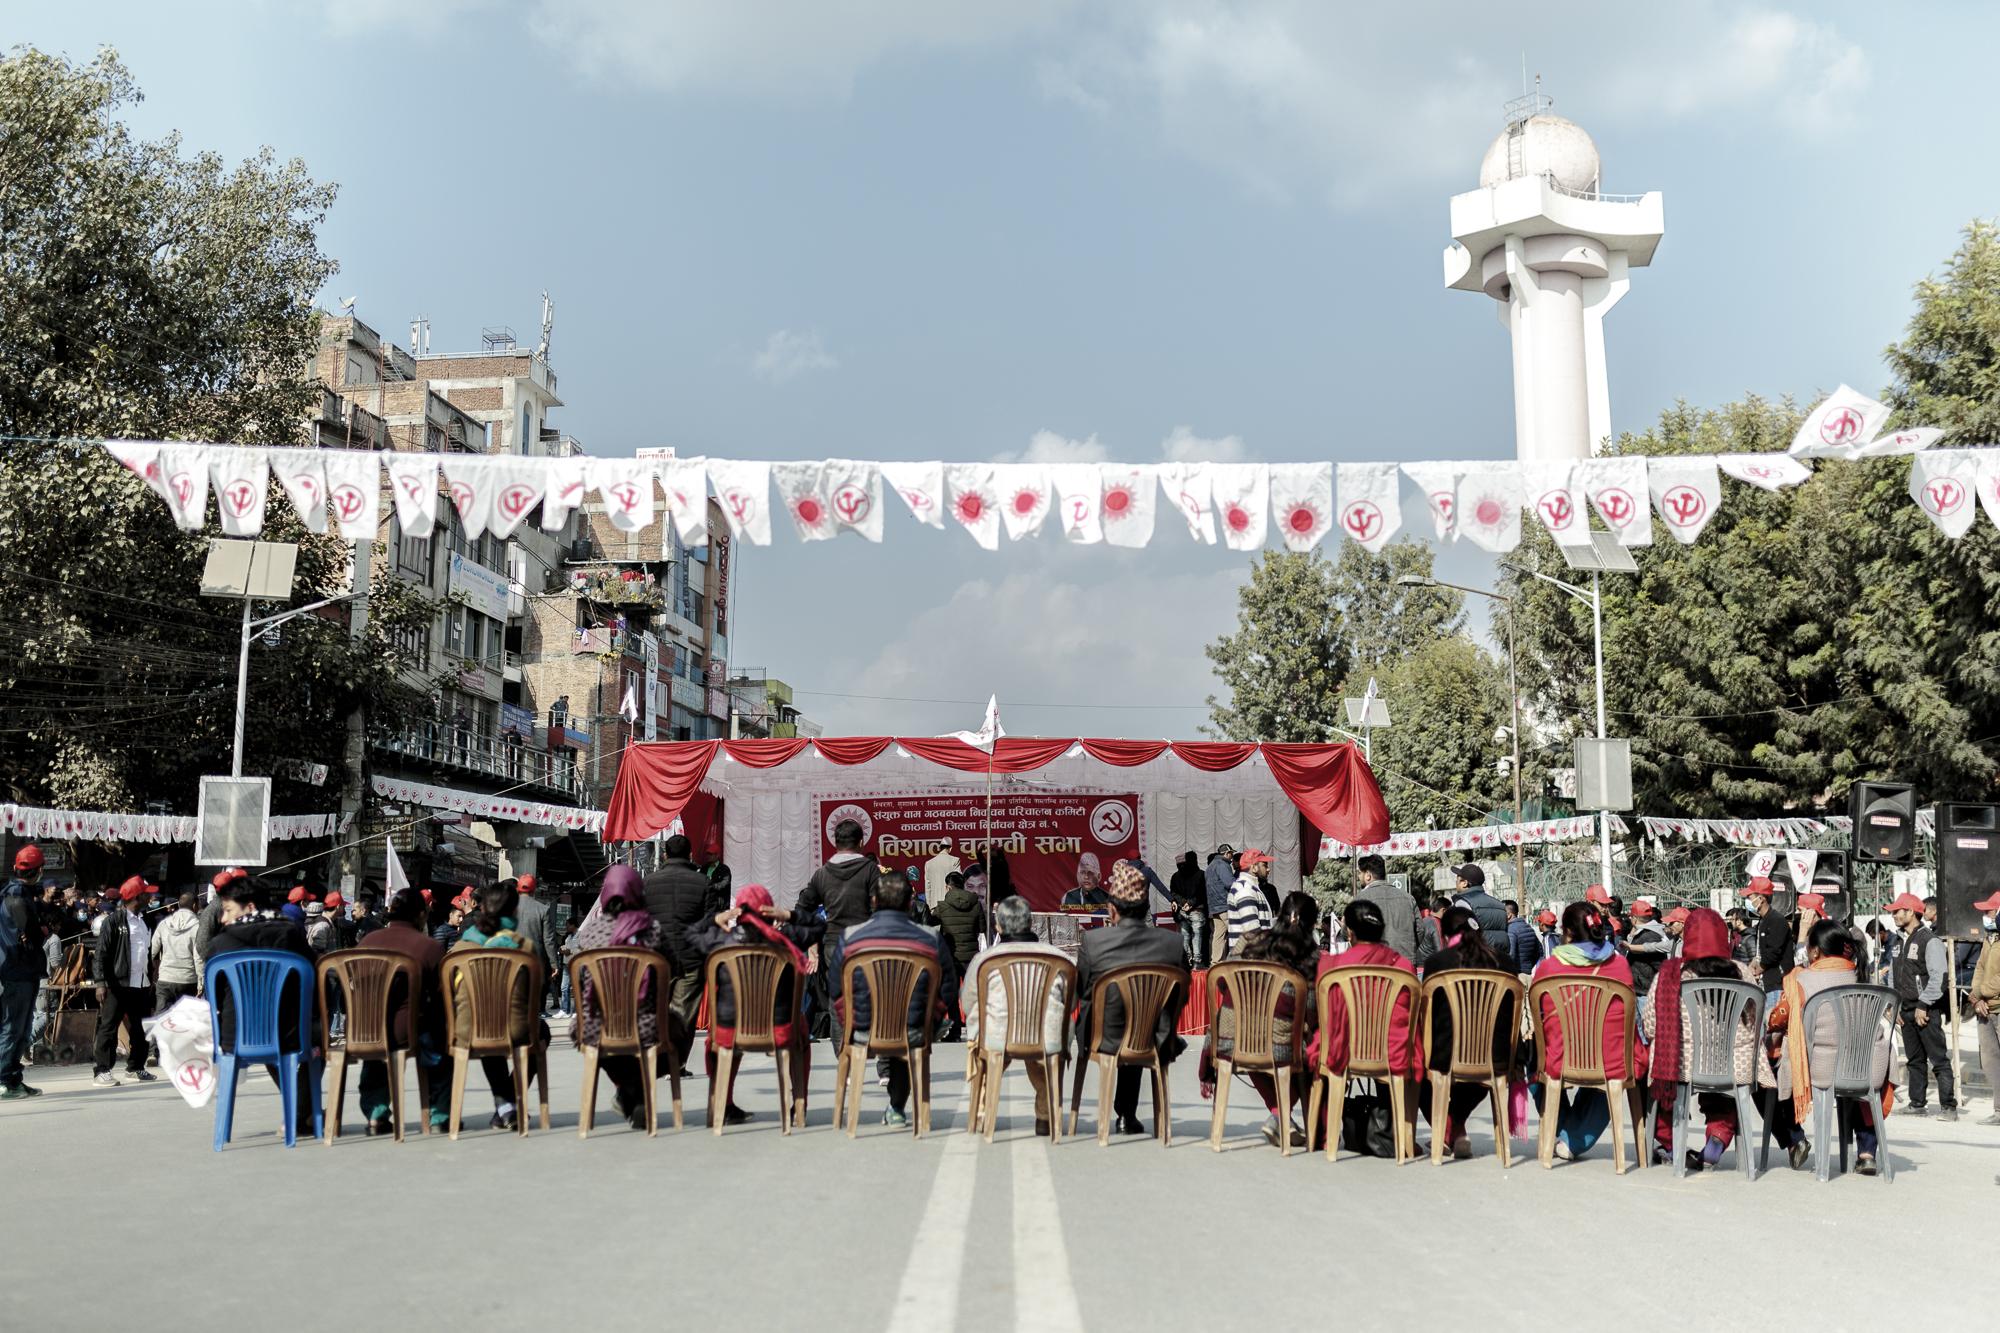 Communist rally, New Baleshwor, Kathmandu, Nepal, 2017